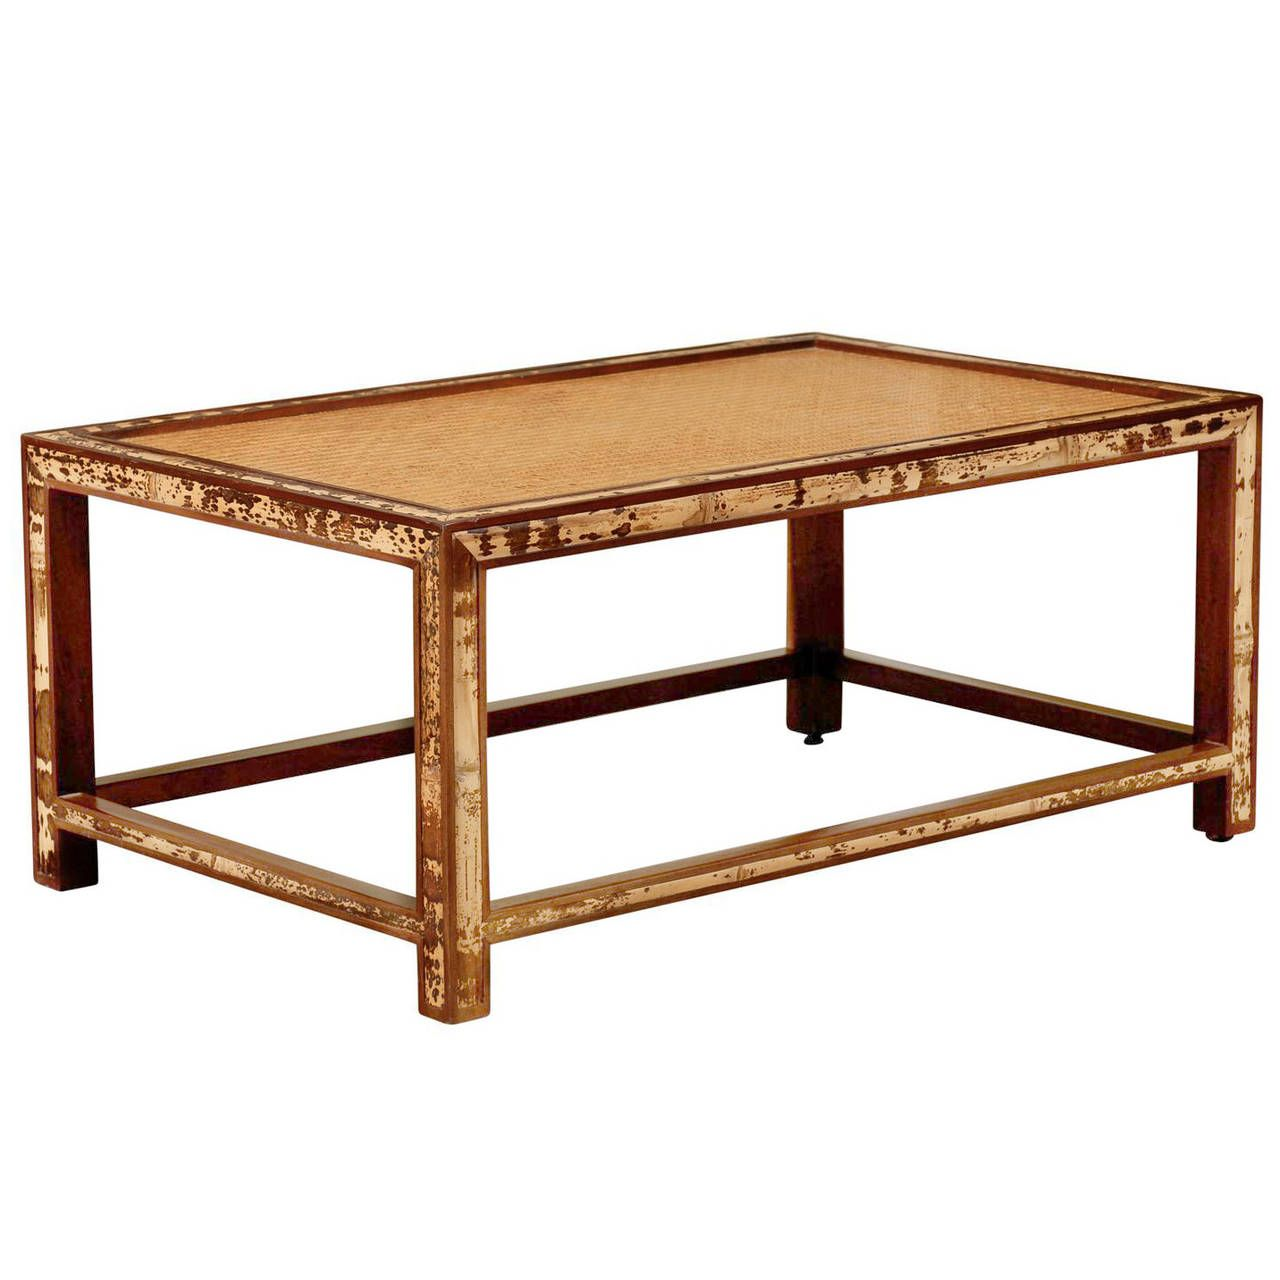 Beautiful Vintage Bamboo And Raffia Coffee Table Coffee Table Coffee Table Vintage Table [ 1280 x 1280 Pixel ]